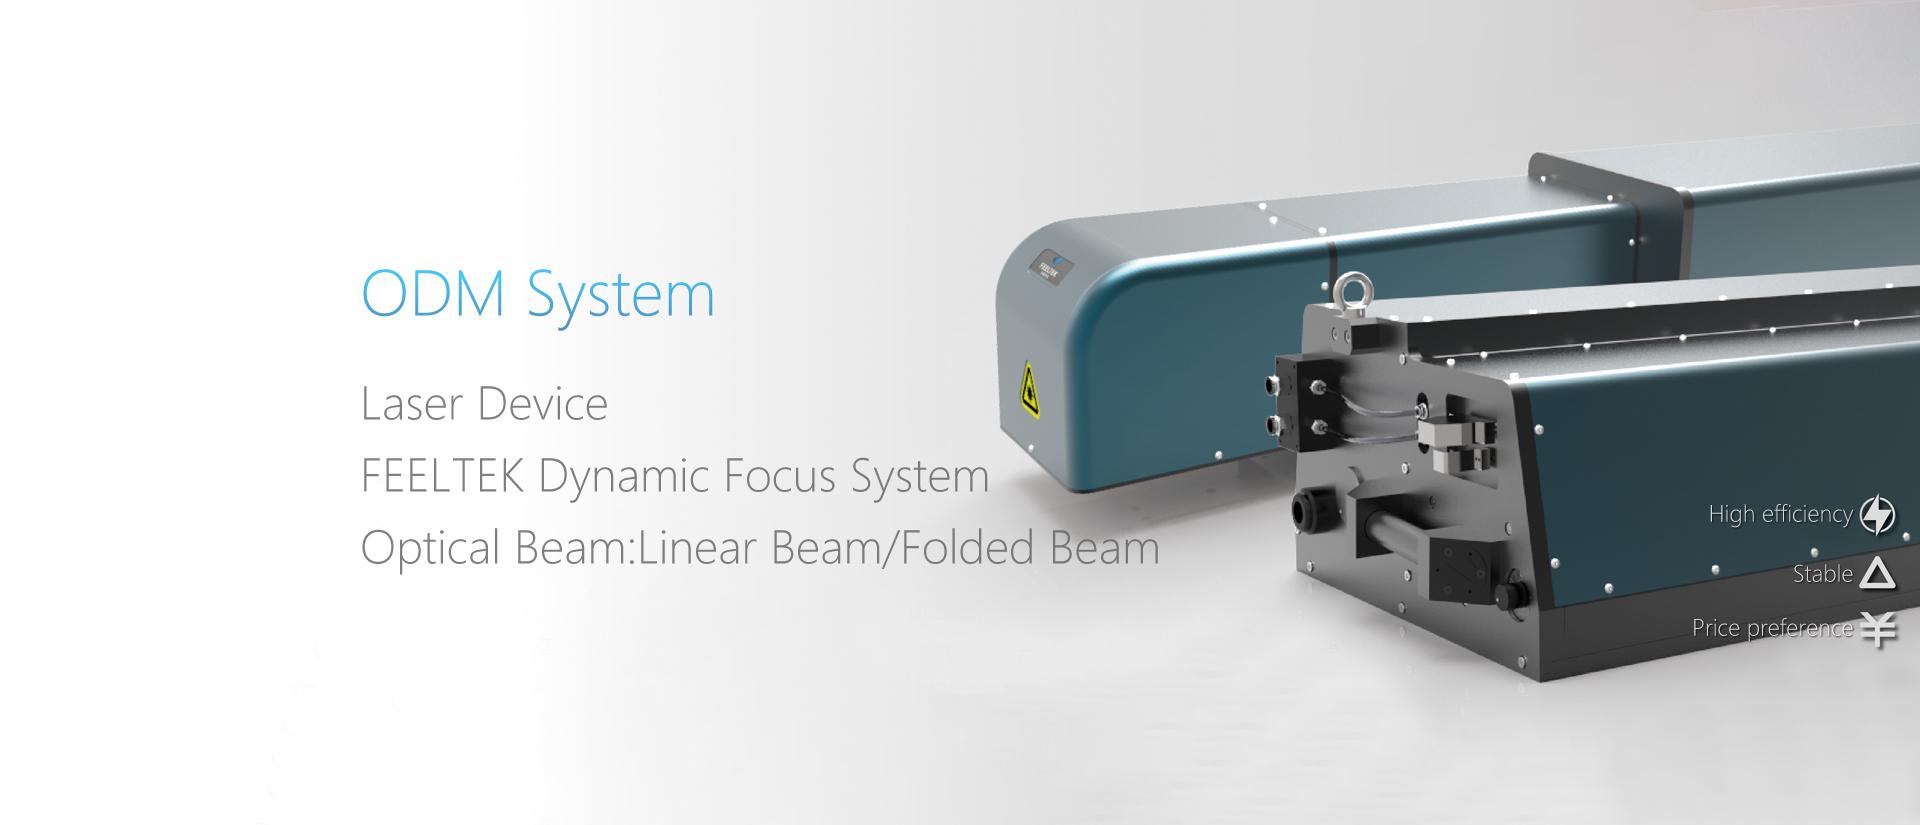 ODM System